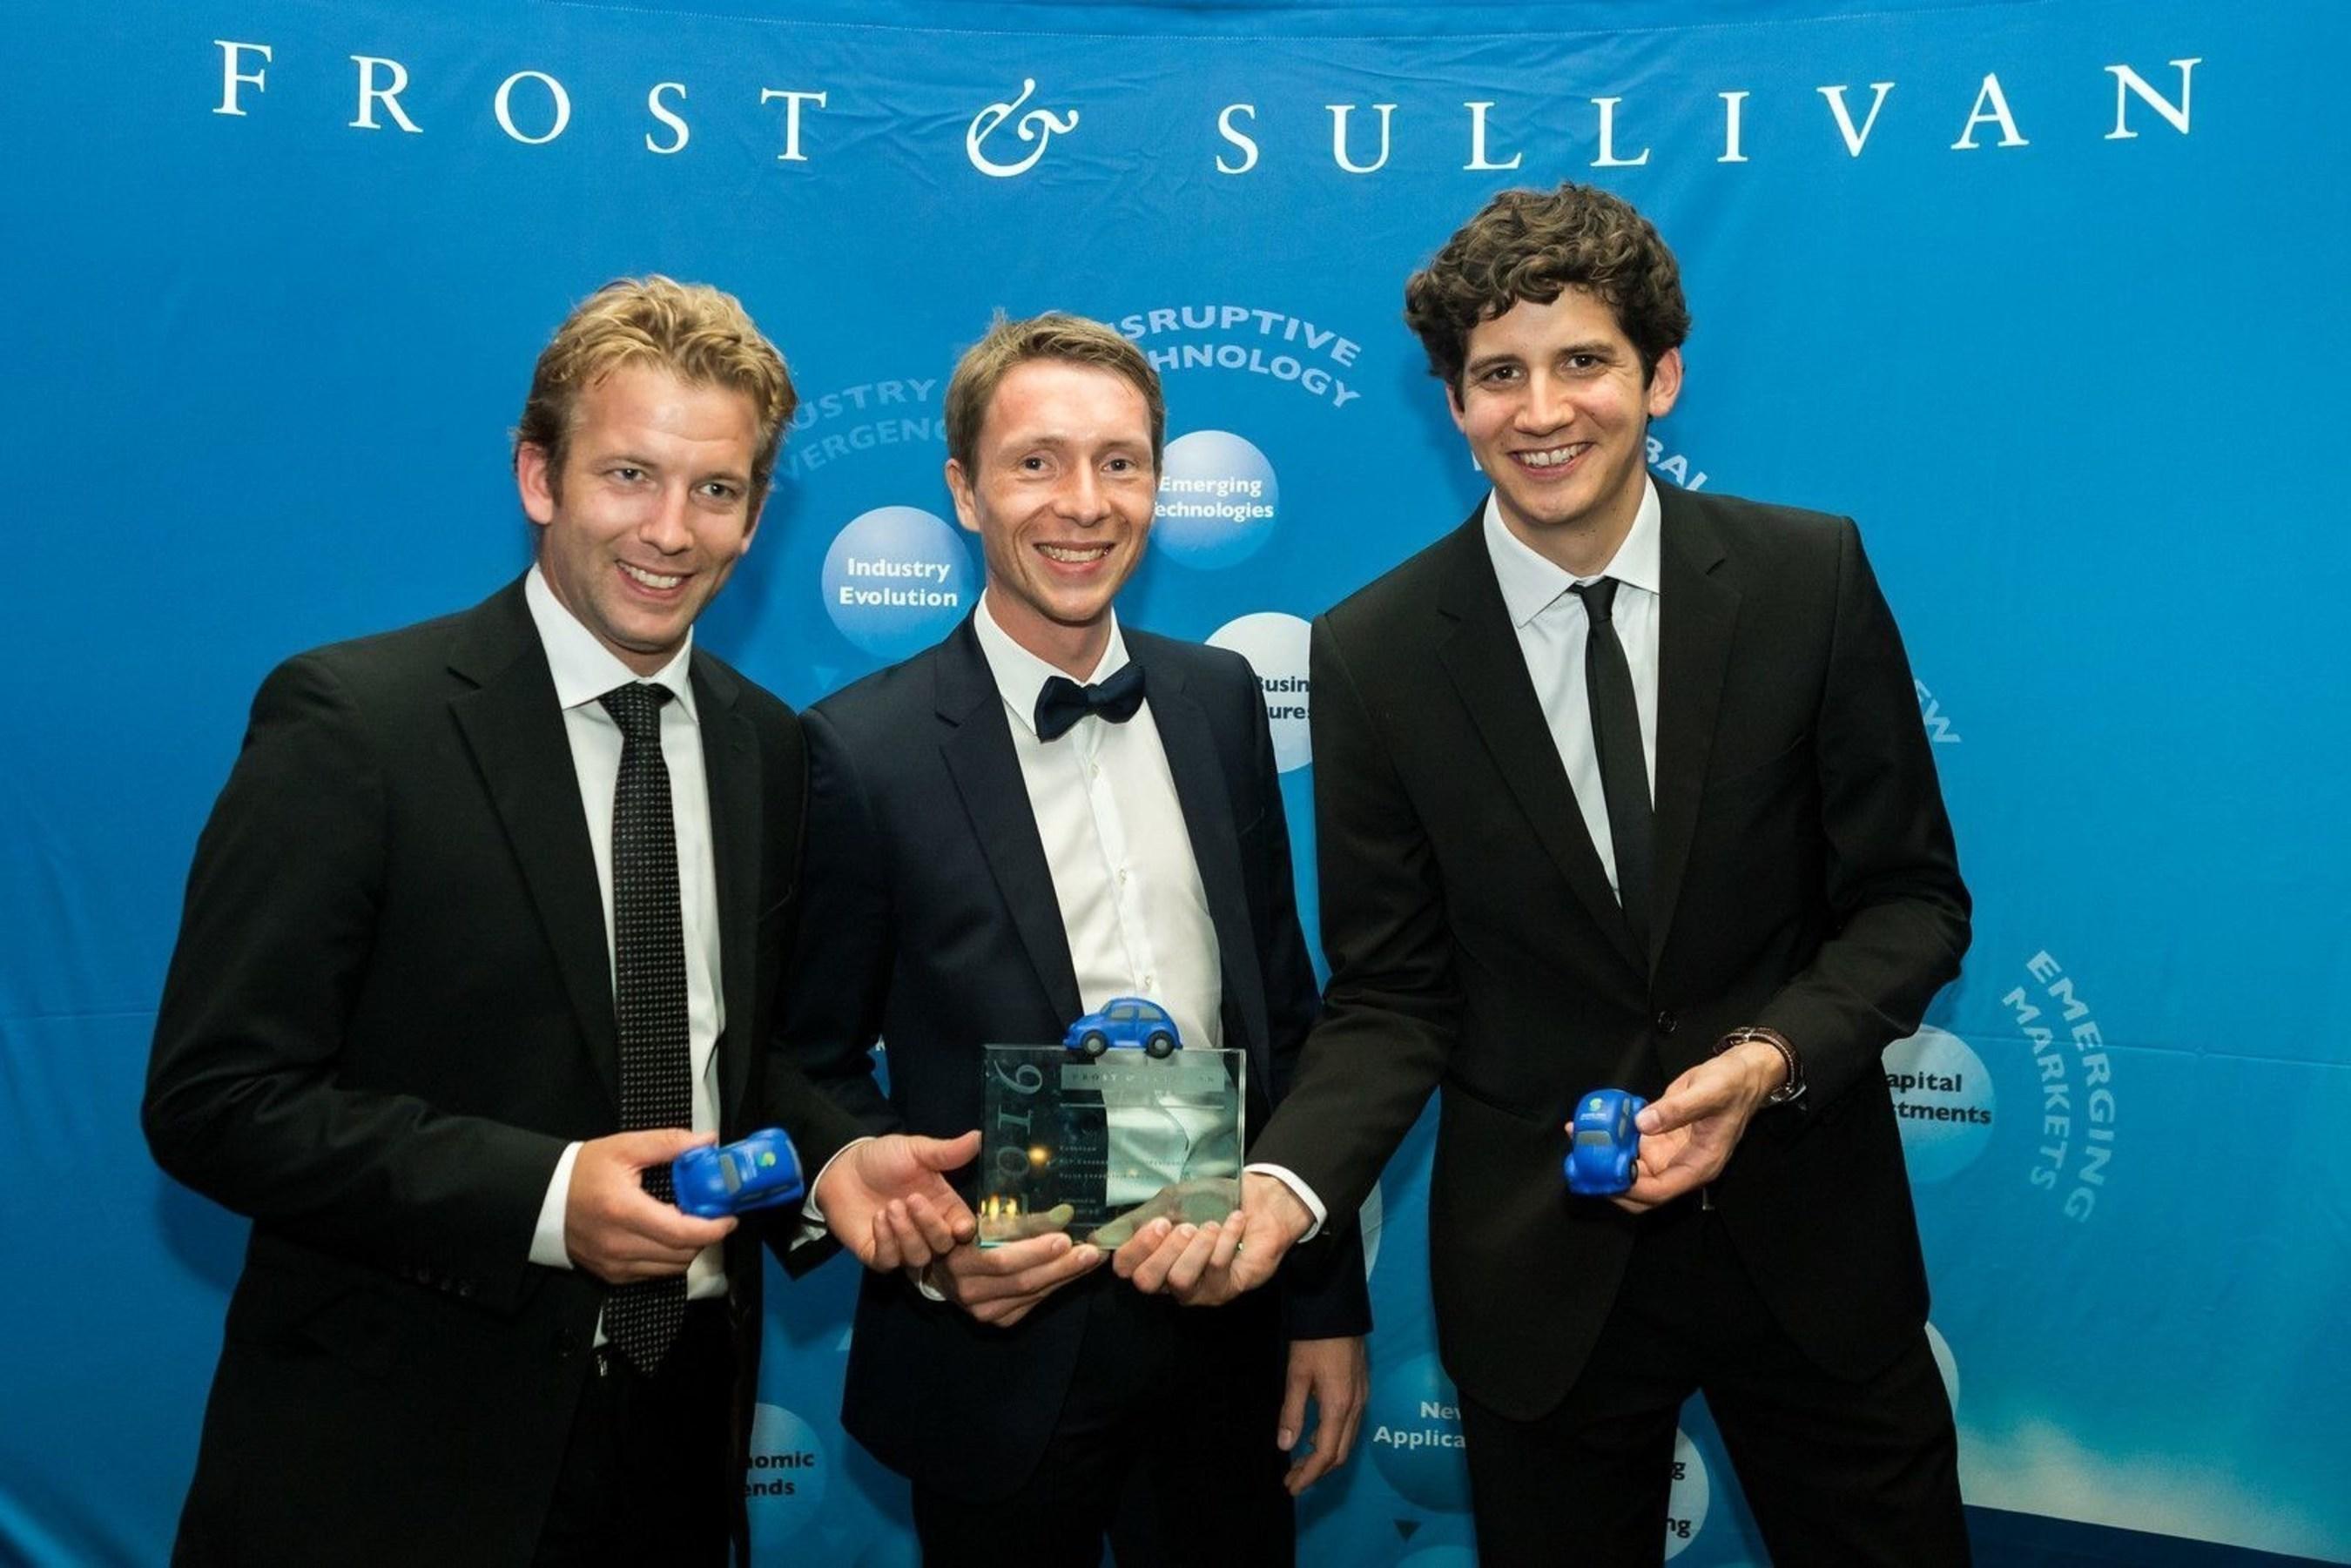 sharoo receives European P2P Carsharing Price/Performance Value Leadership Award 2016. sharoo at the Award Ceremony - June 2016. (PRNewsFoto/sharoo ag)